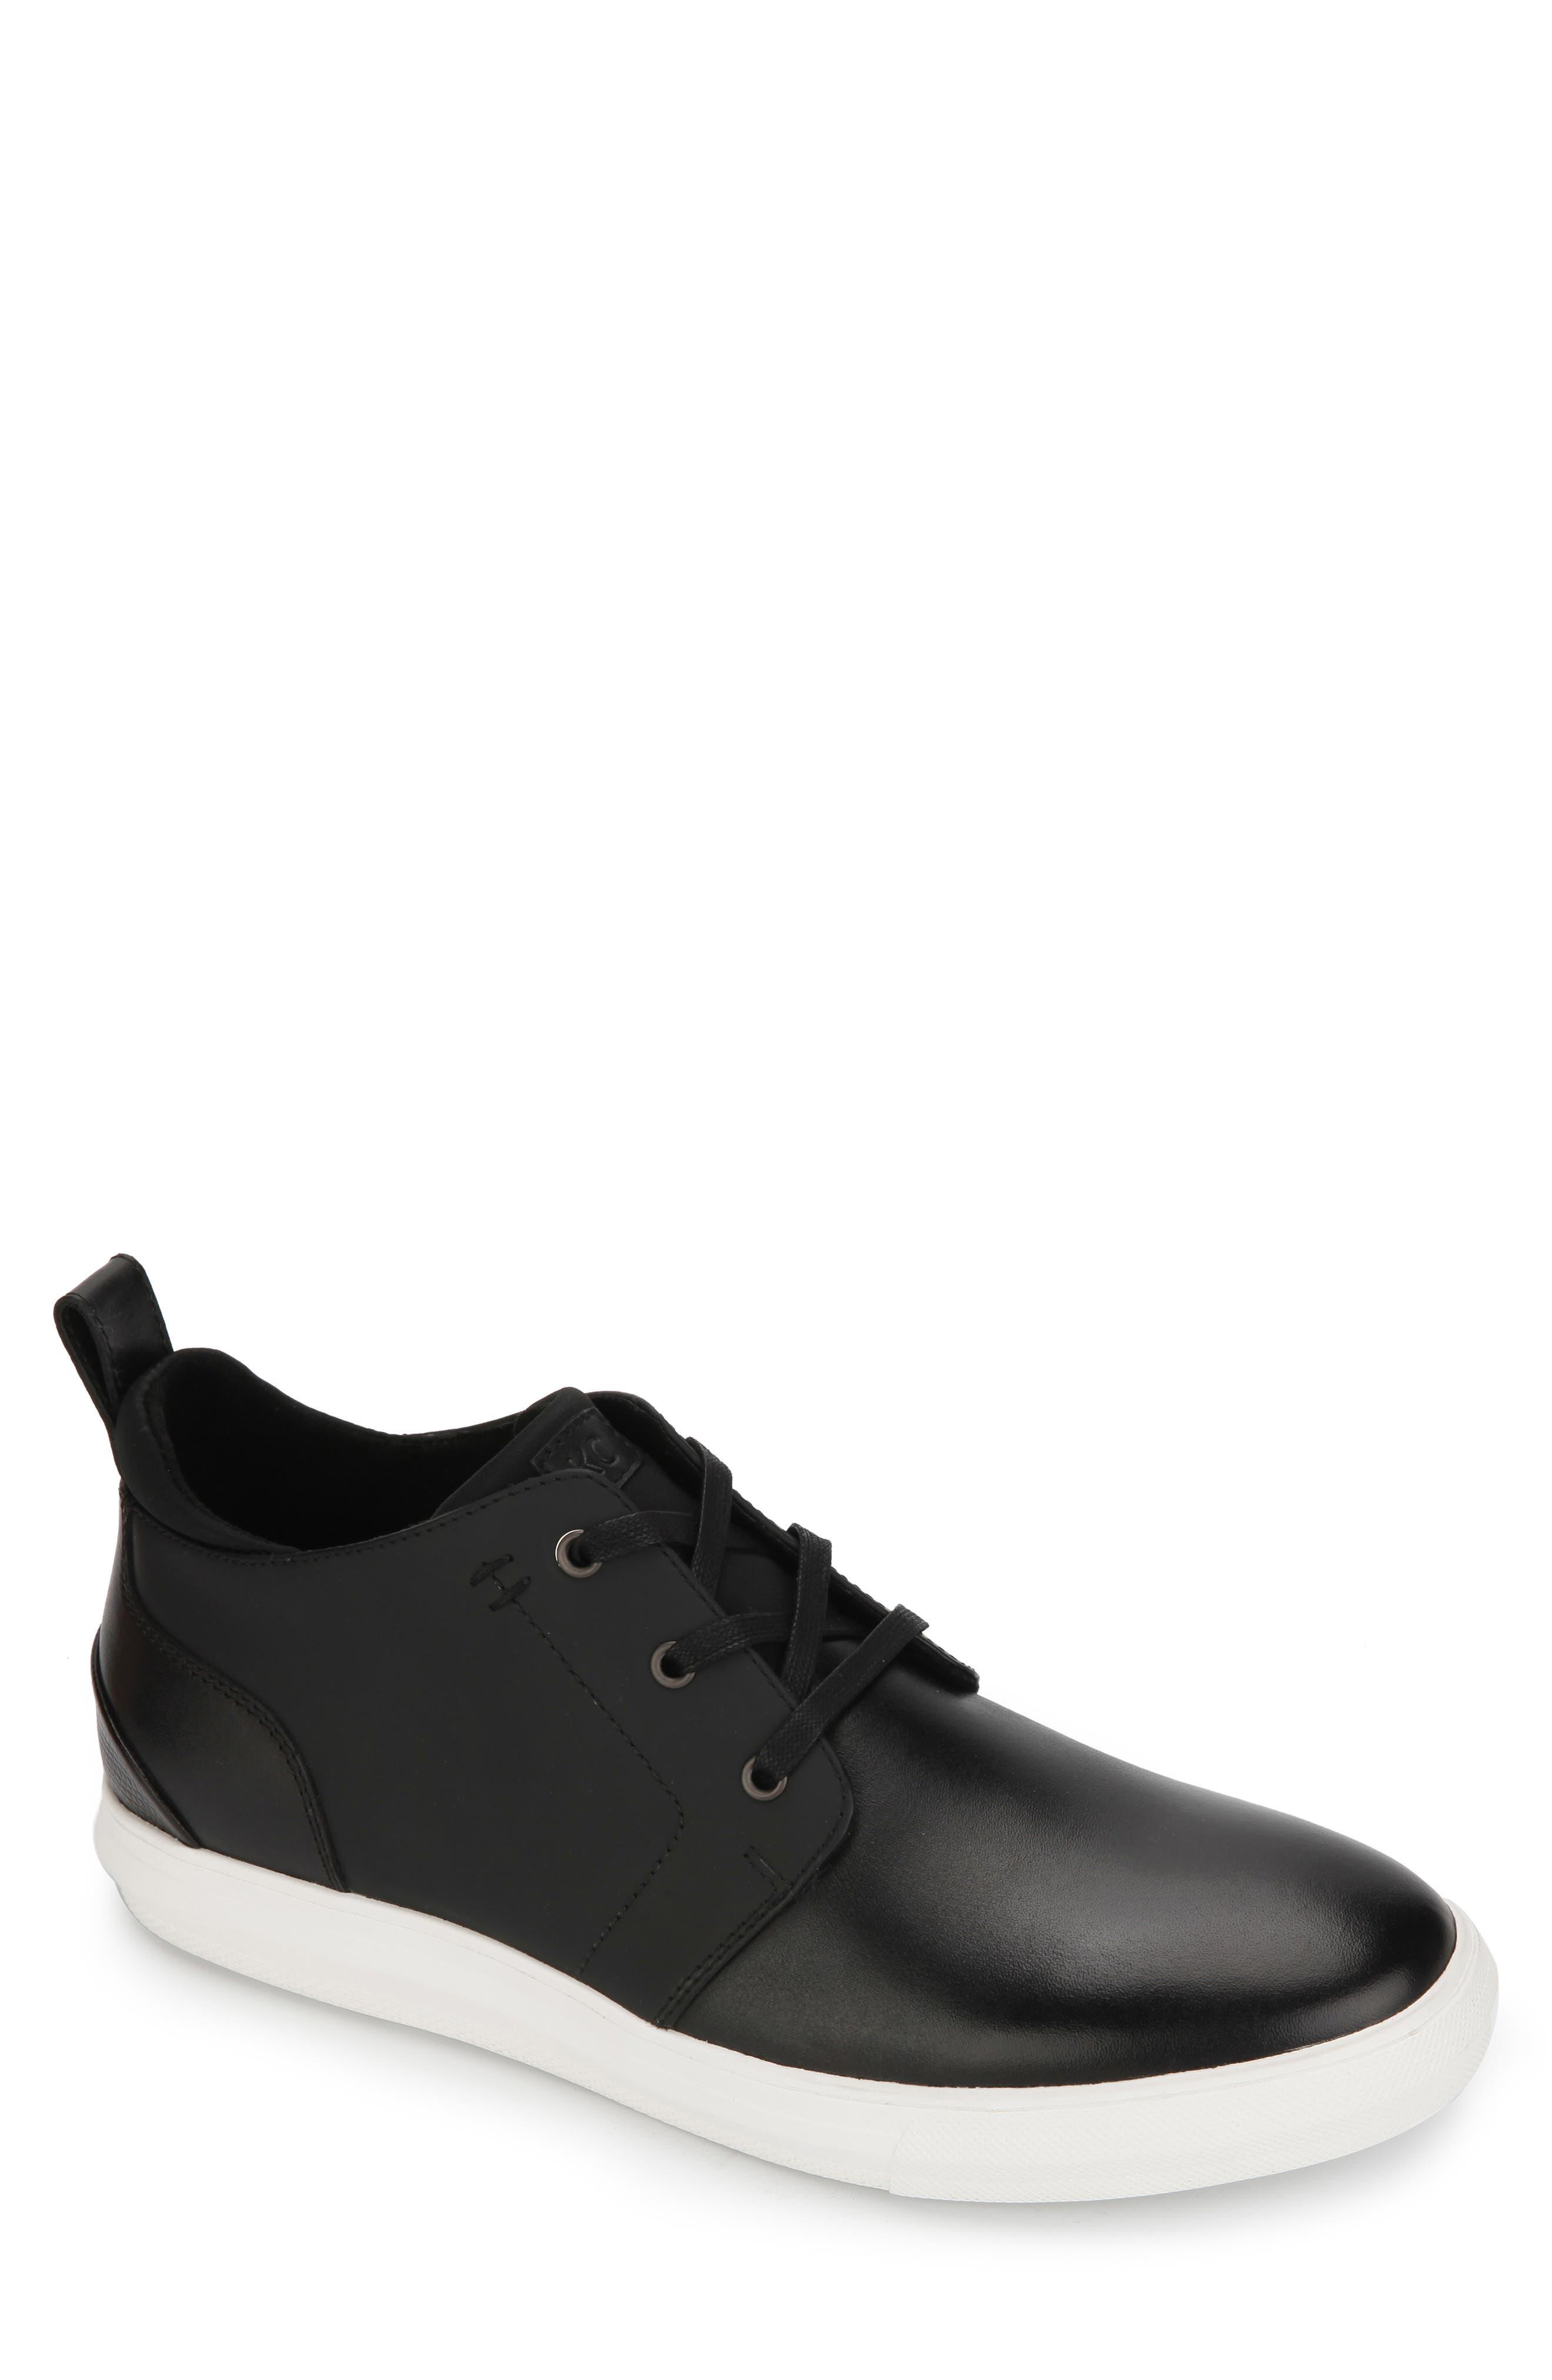 REACTION KENNETH COLE, Reemer Chukka Sneaker, Main thumbnail 1, color, BLACK